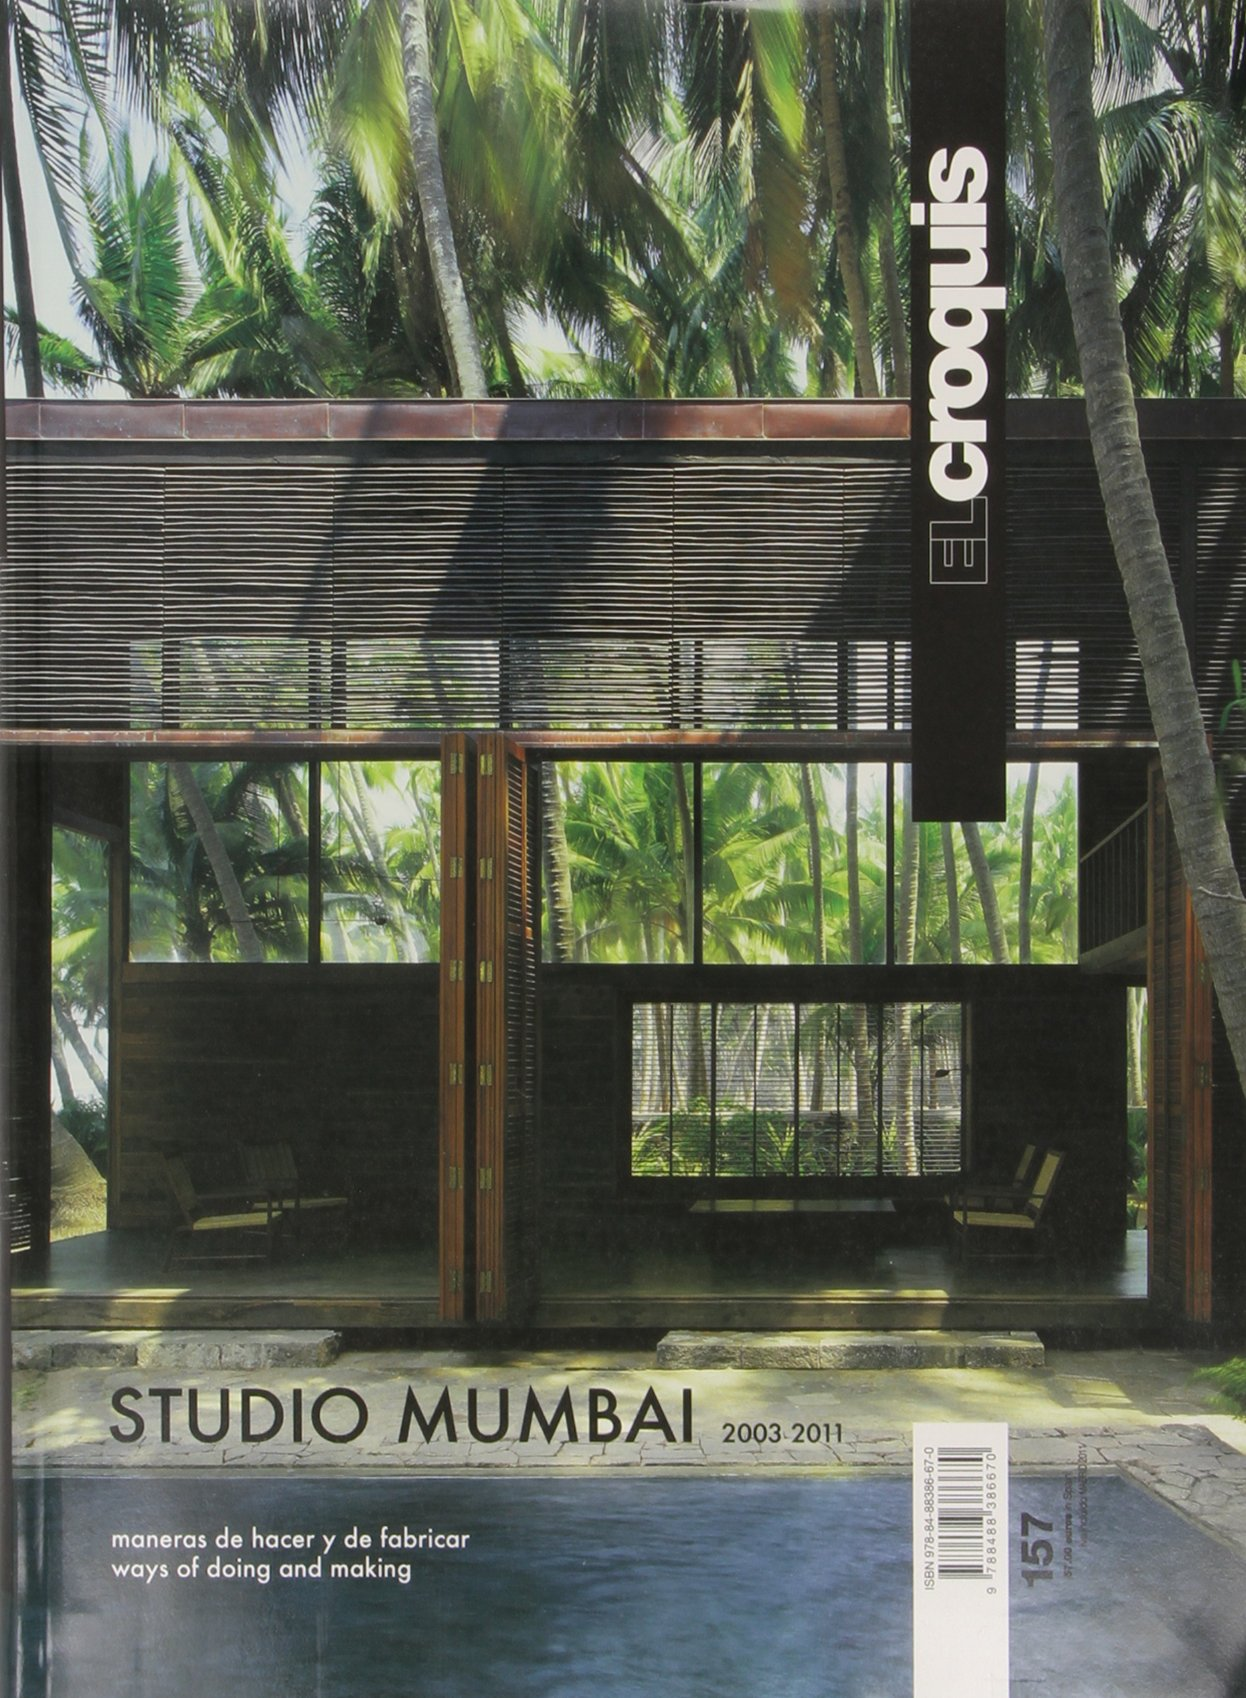 Studio Mumbai 2003-2011: Maneras de hacer y de fabricar / Ways of doing and making